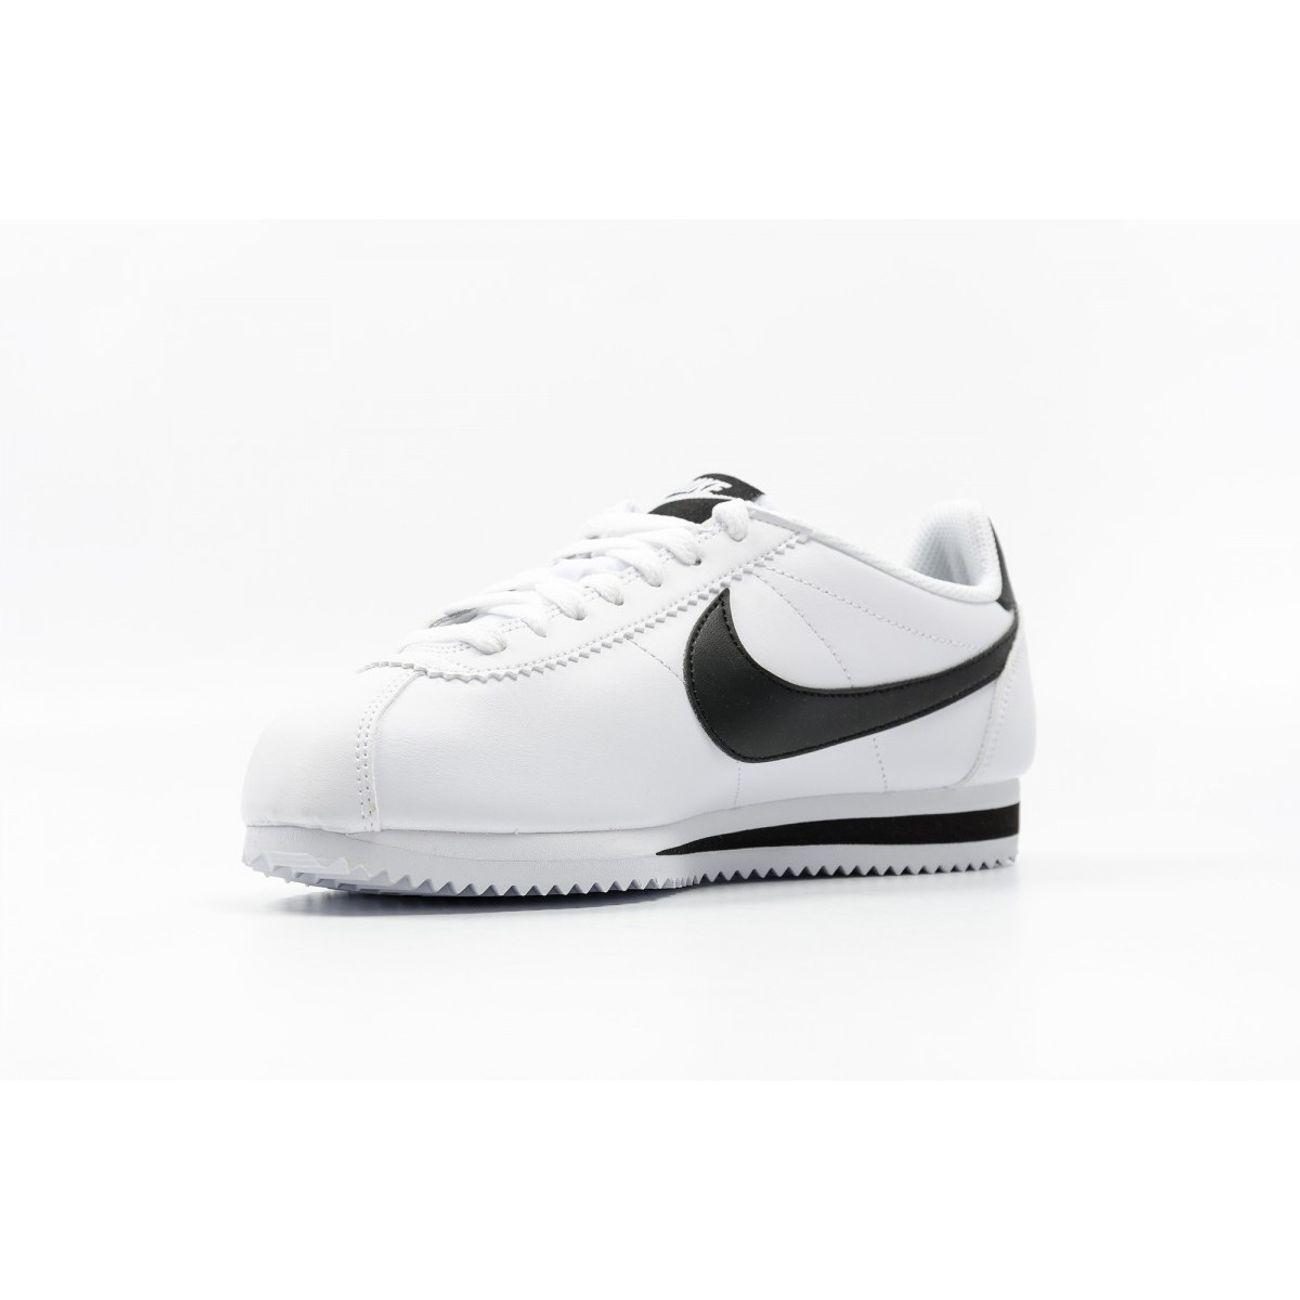 new style 1baf6 7ffb7 Mode- Lifestyle femme NIKE Baskets Nike Nike Classic Cortez Leather -  807471101 ...